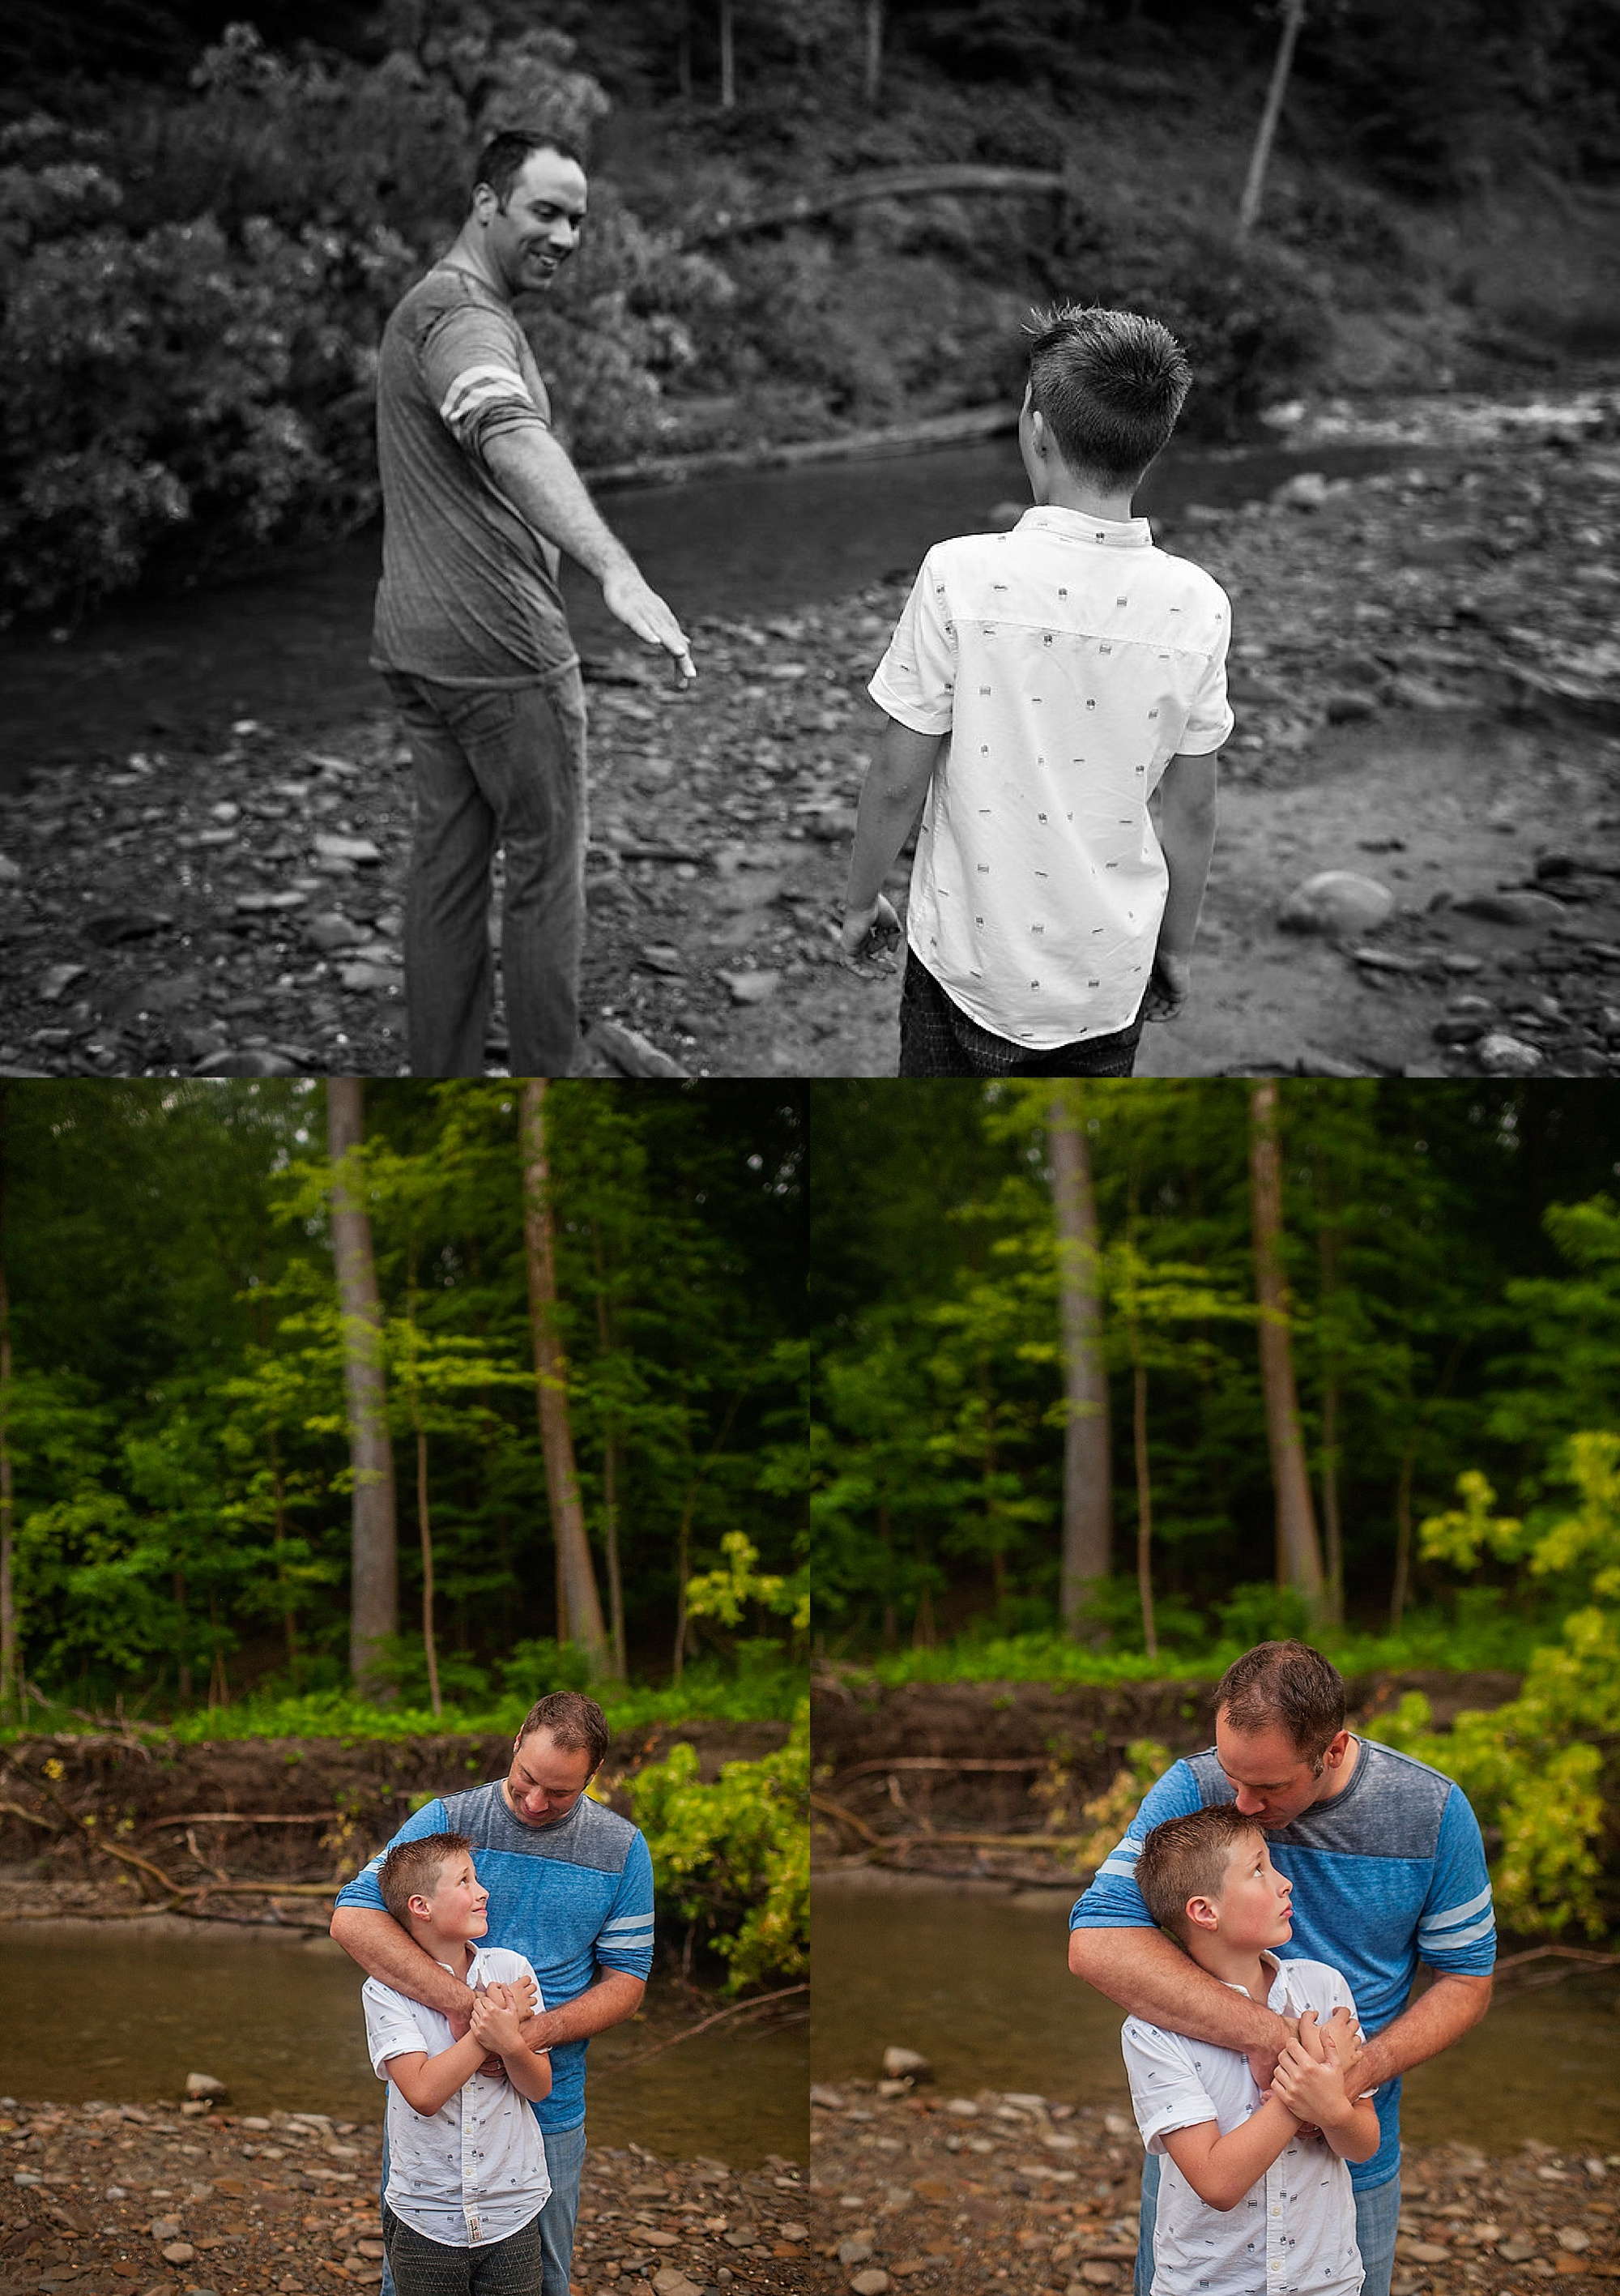 bandy-family-lauren-grayson-akron-ohio_0005.jpg